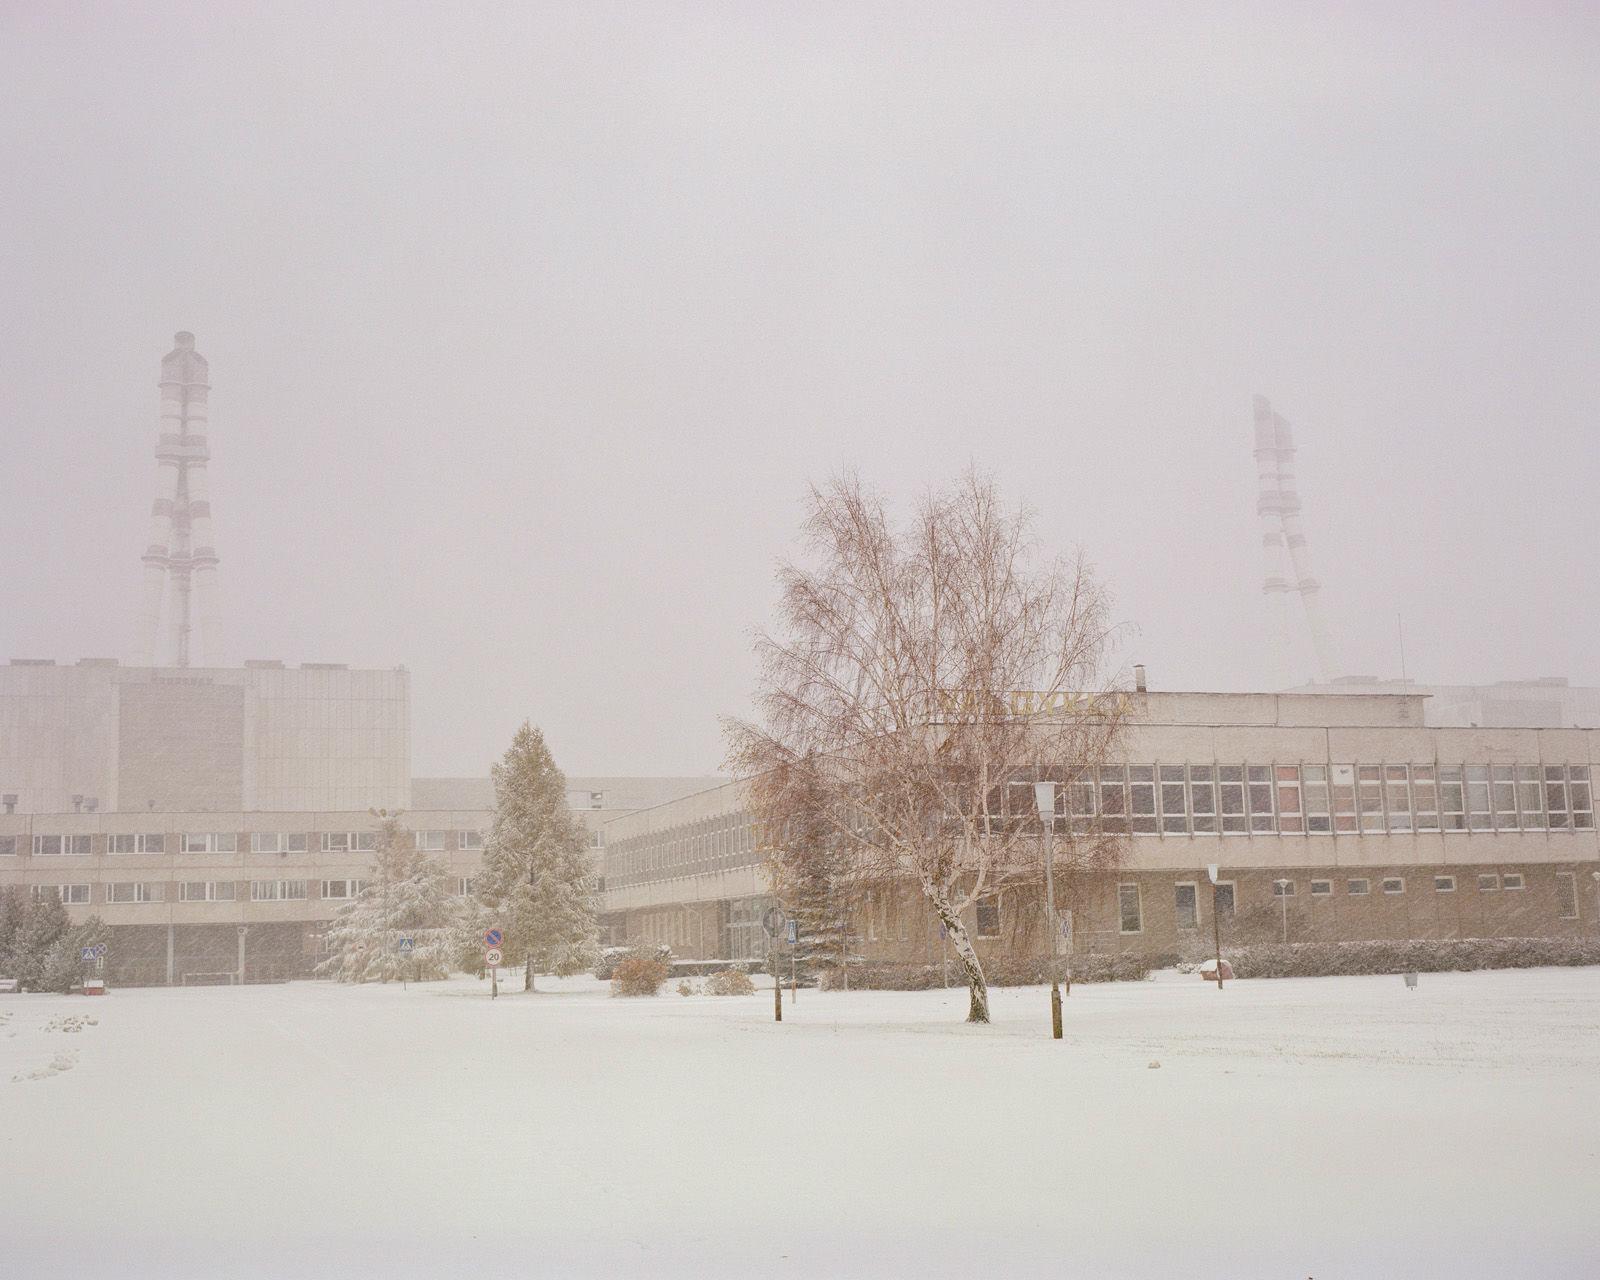 La central nuclear de Ignalina.